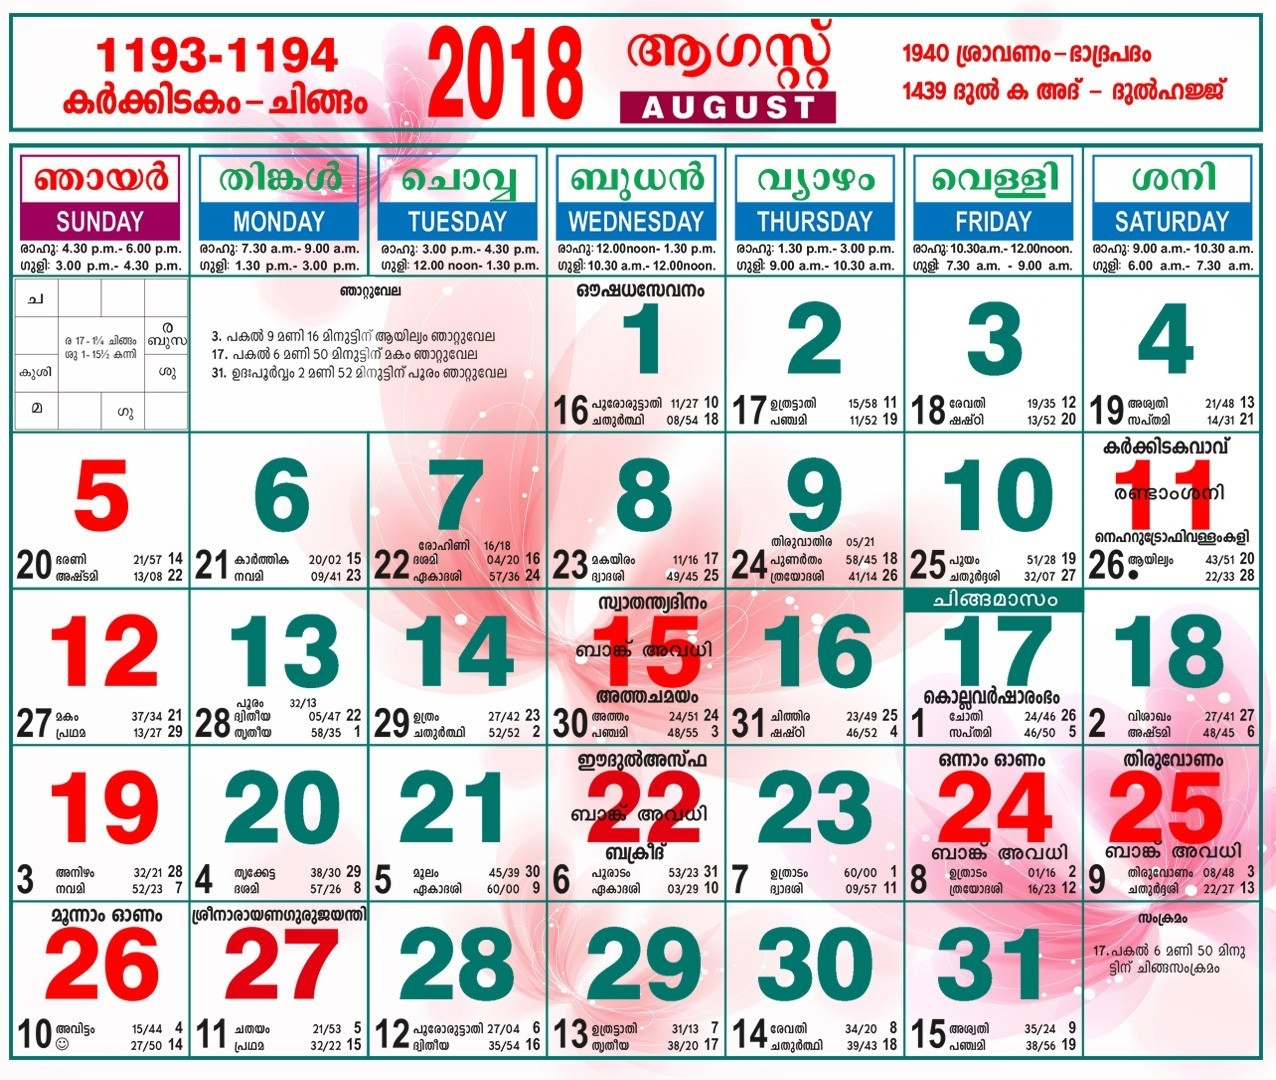 Calendar 2001 Malayalam August Image | Calendar Template  Calendar 2001 Malayalam August Image